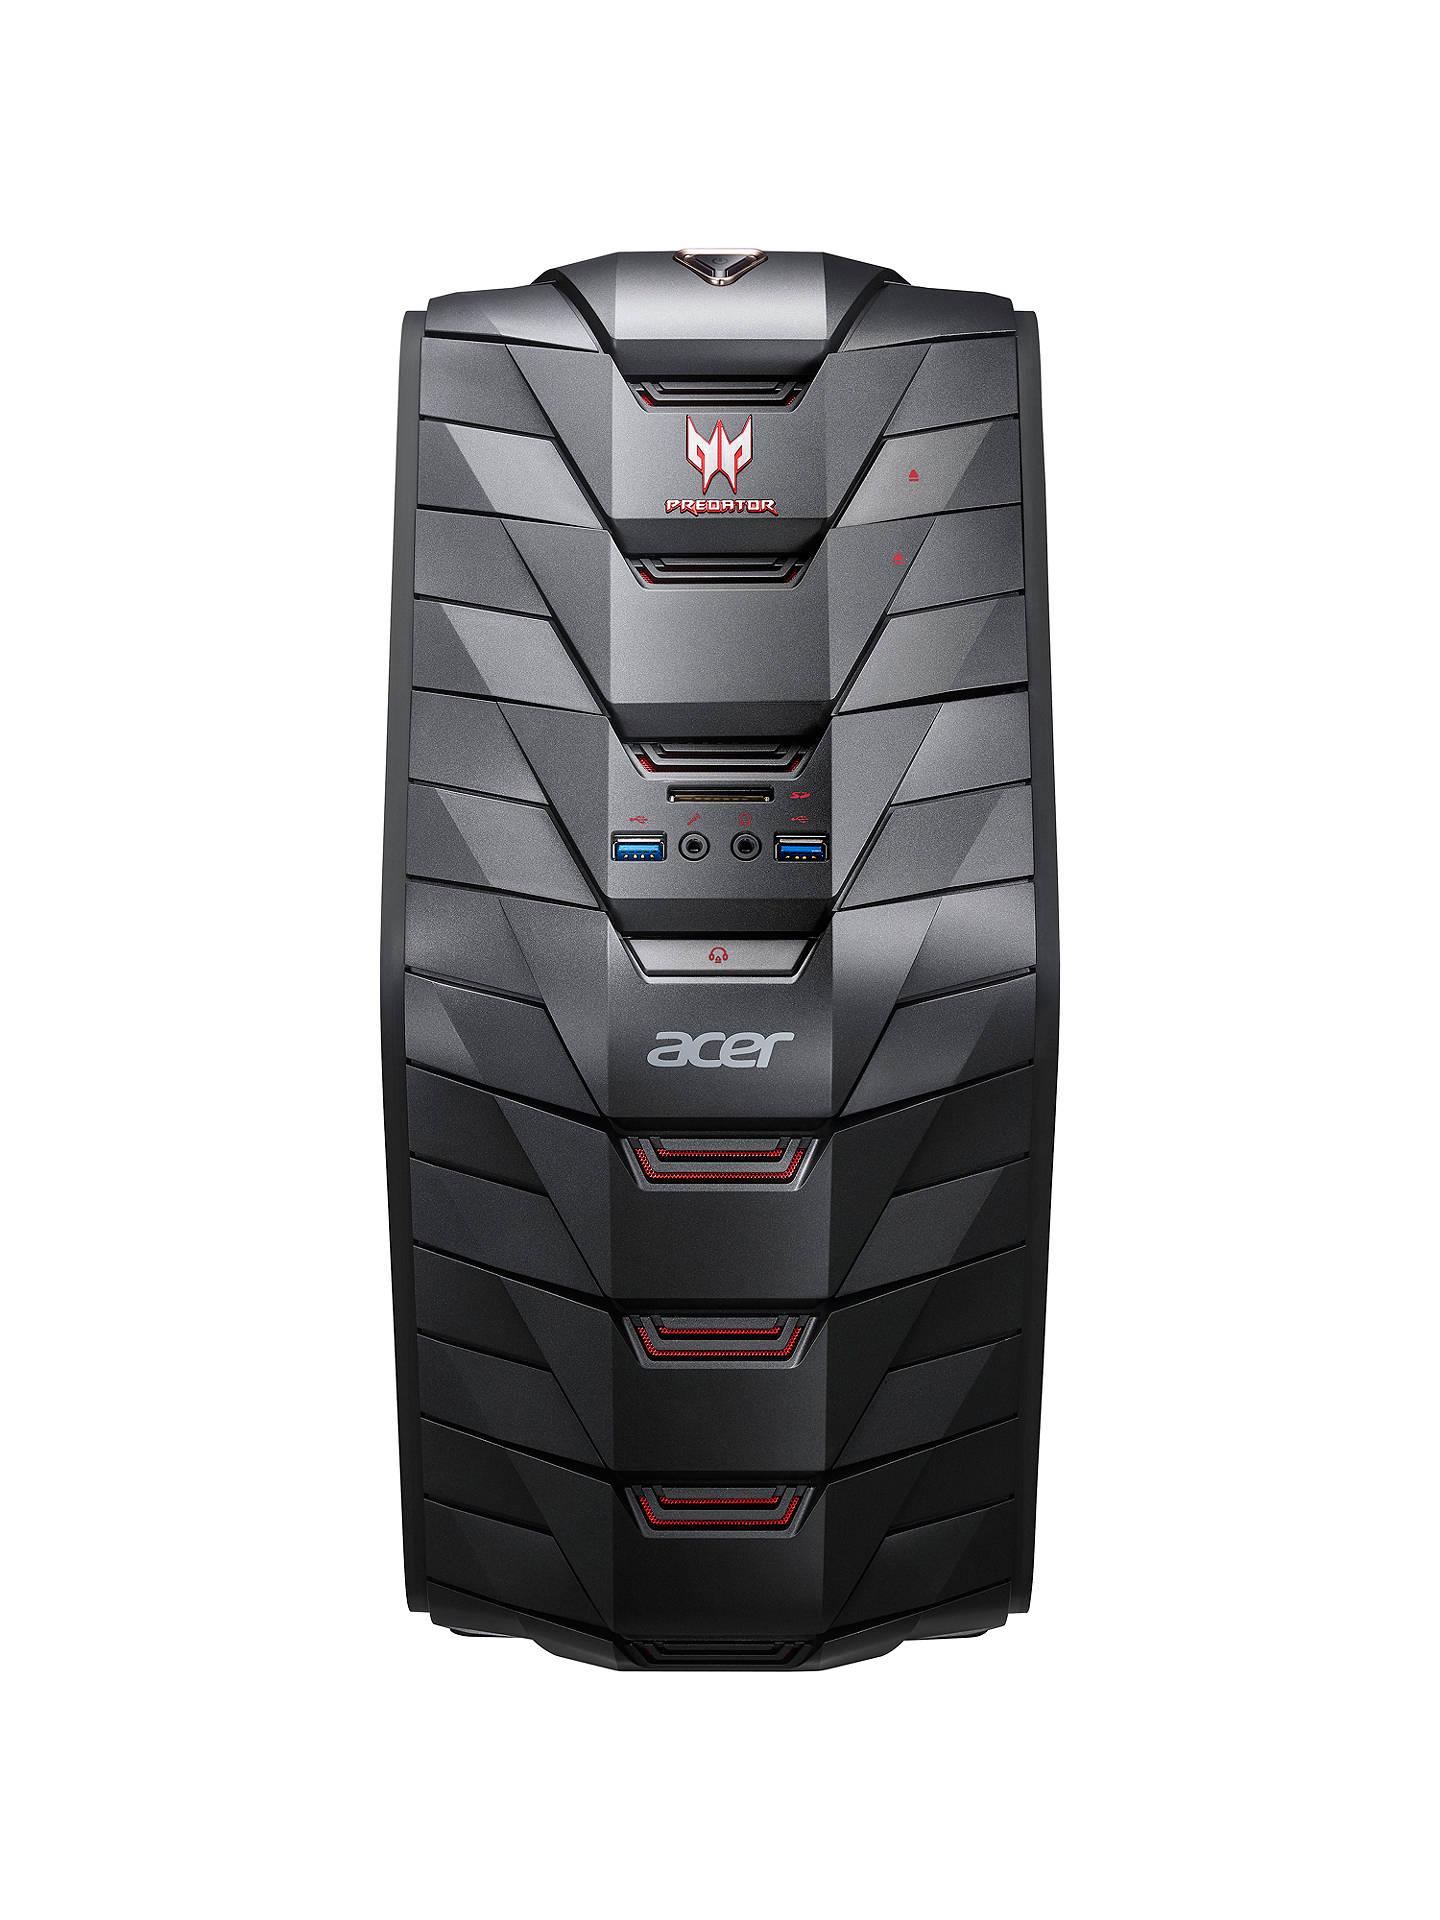 Acer Aspire G3-605 Realtek Audio Drivers for Windows XP